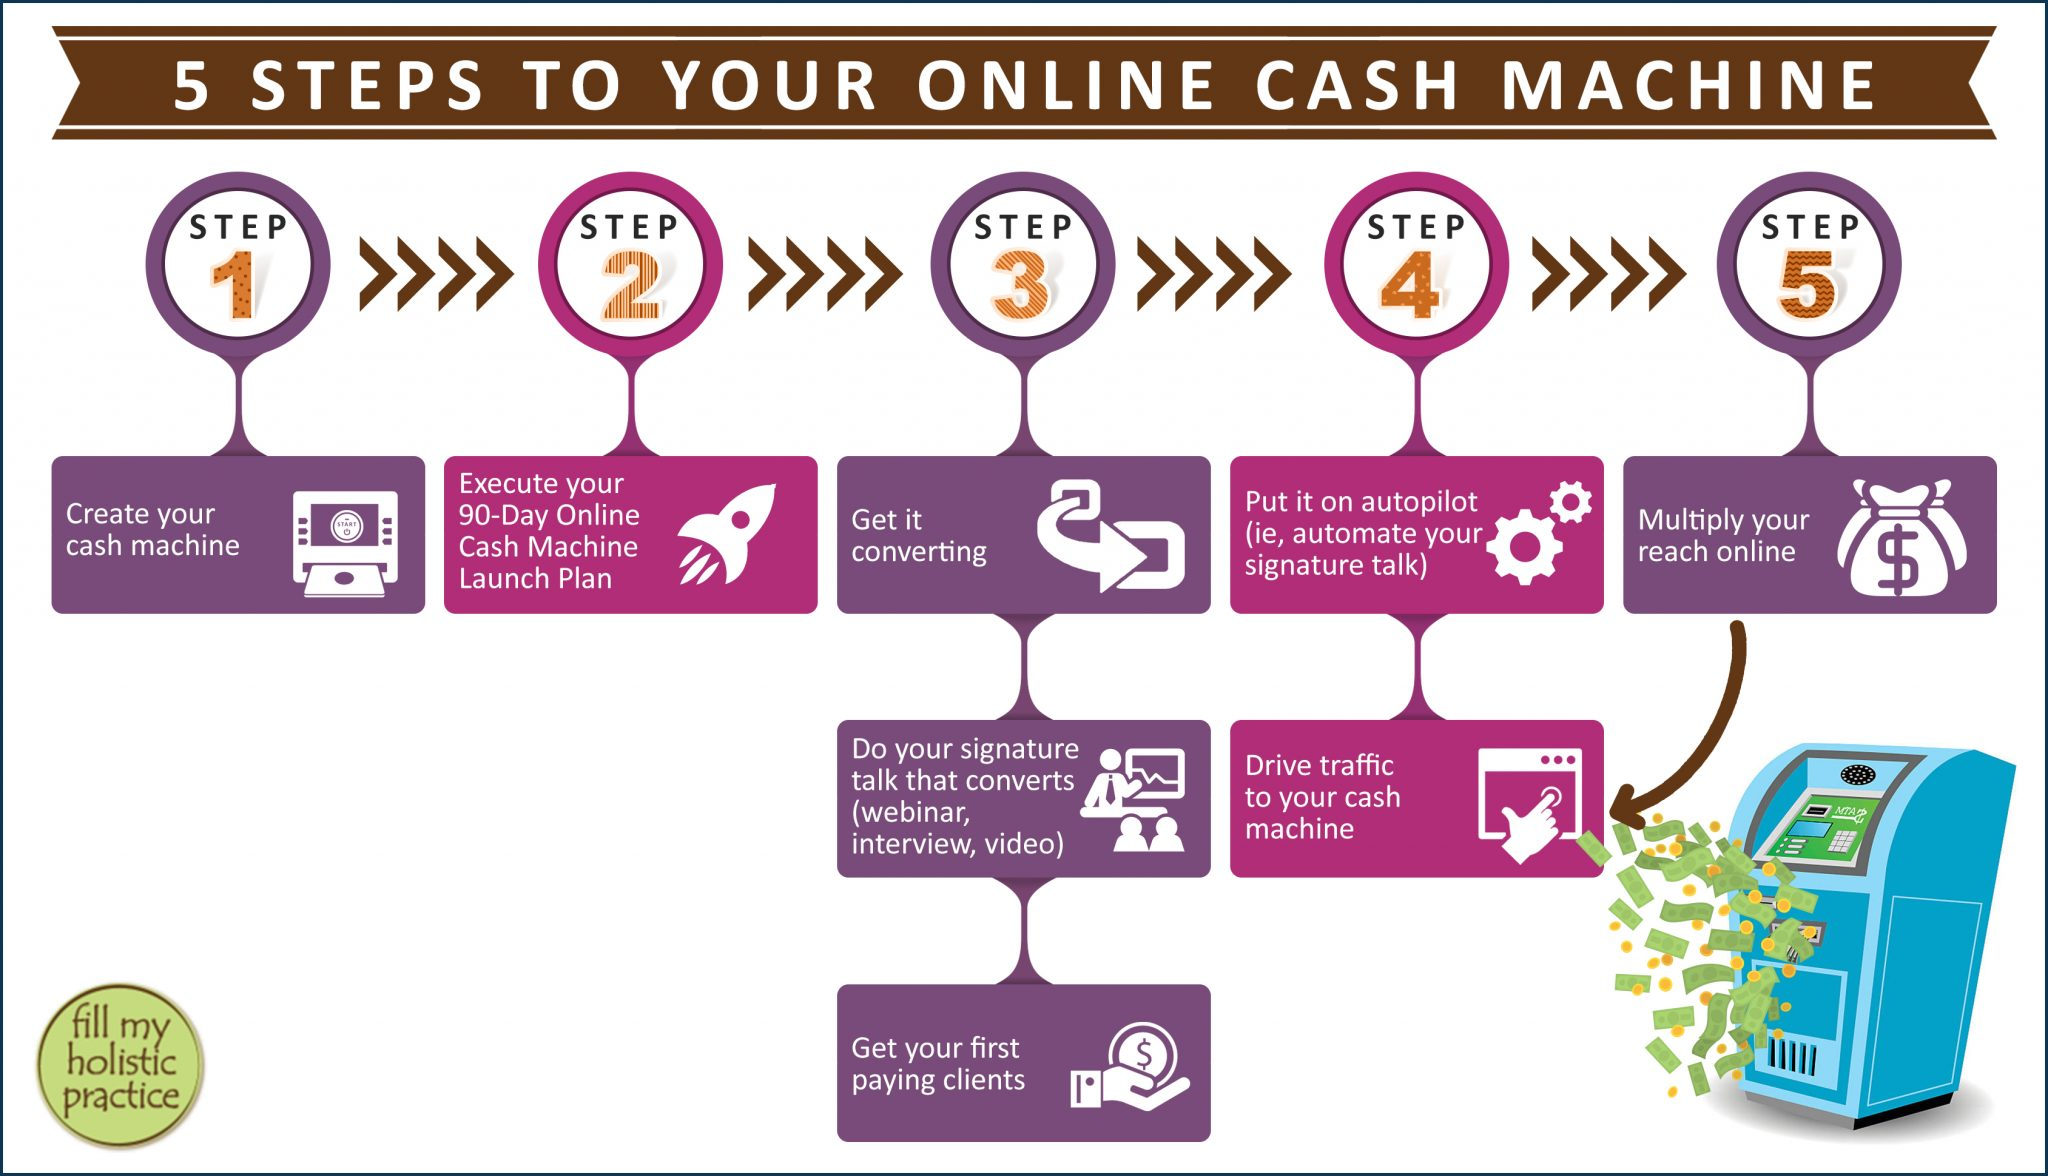 5 Steps to Online Cash Machine-Visual Framework